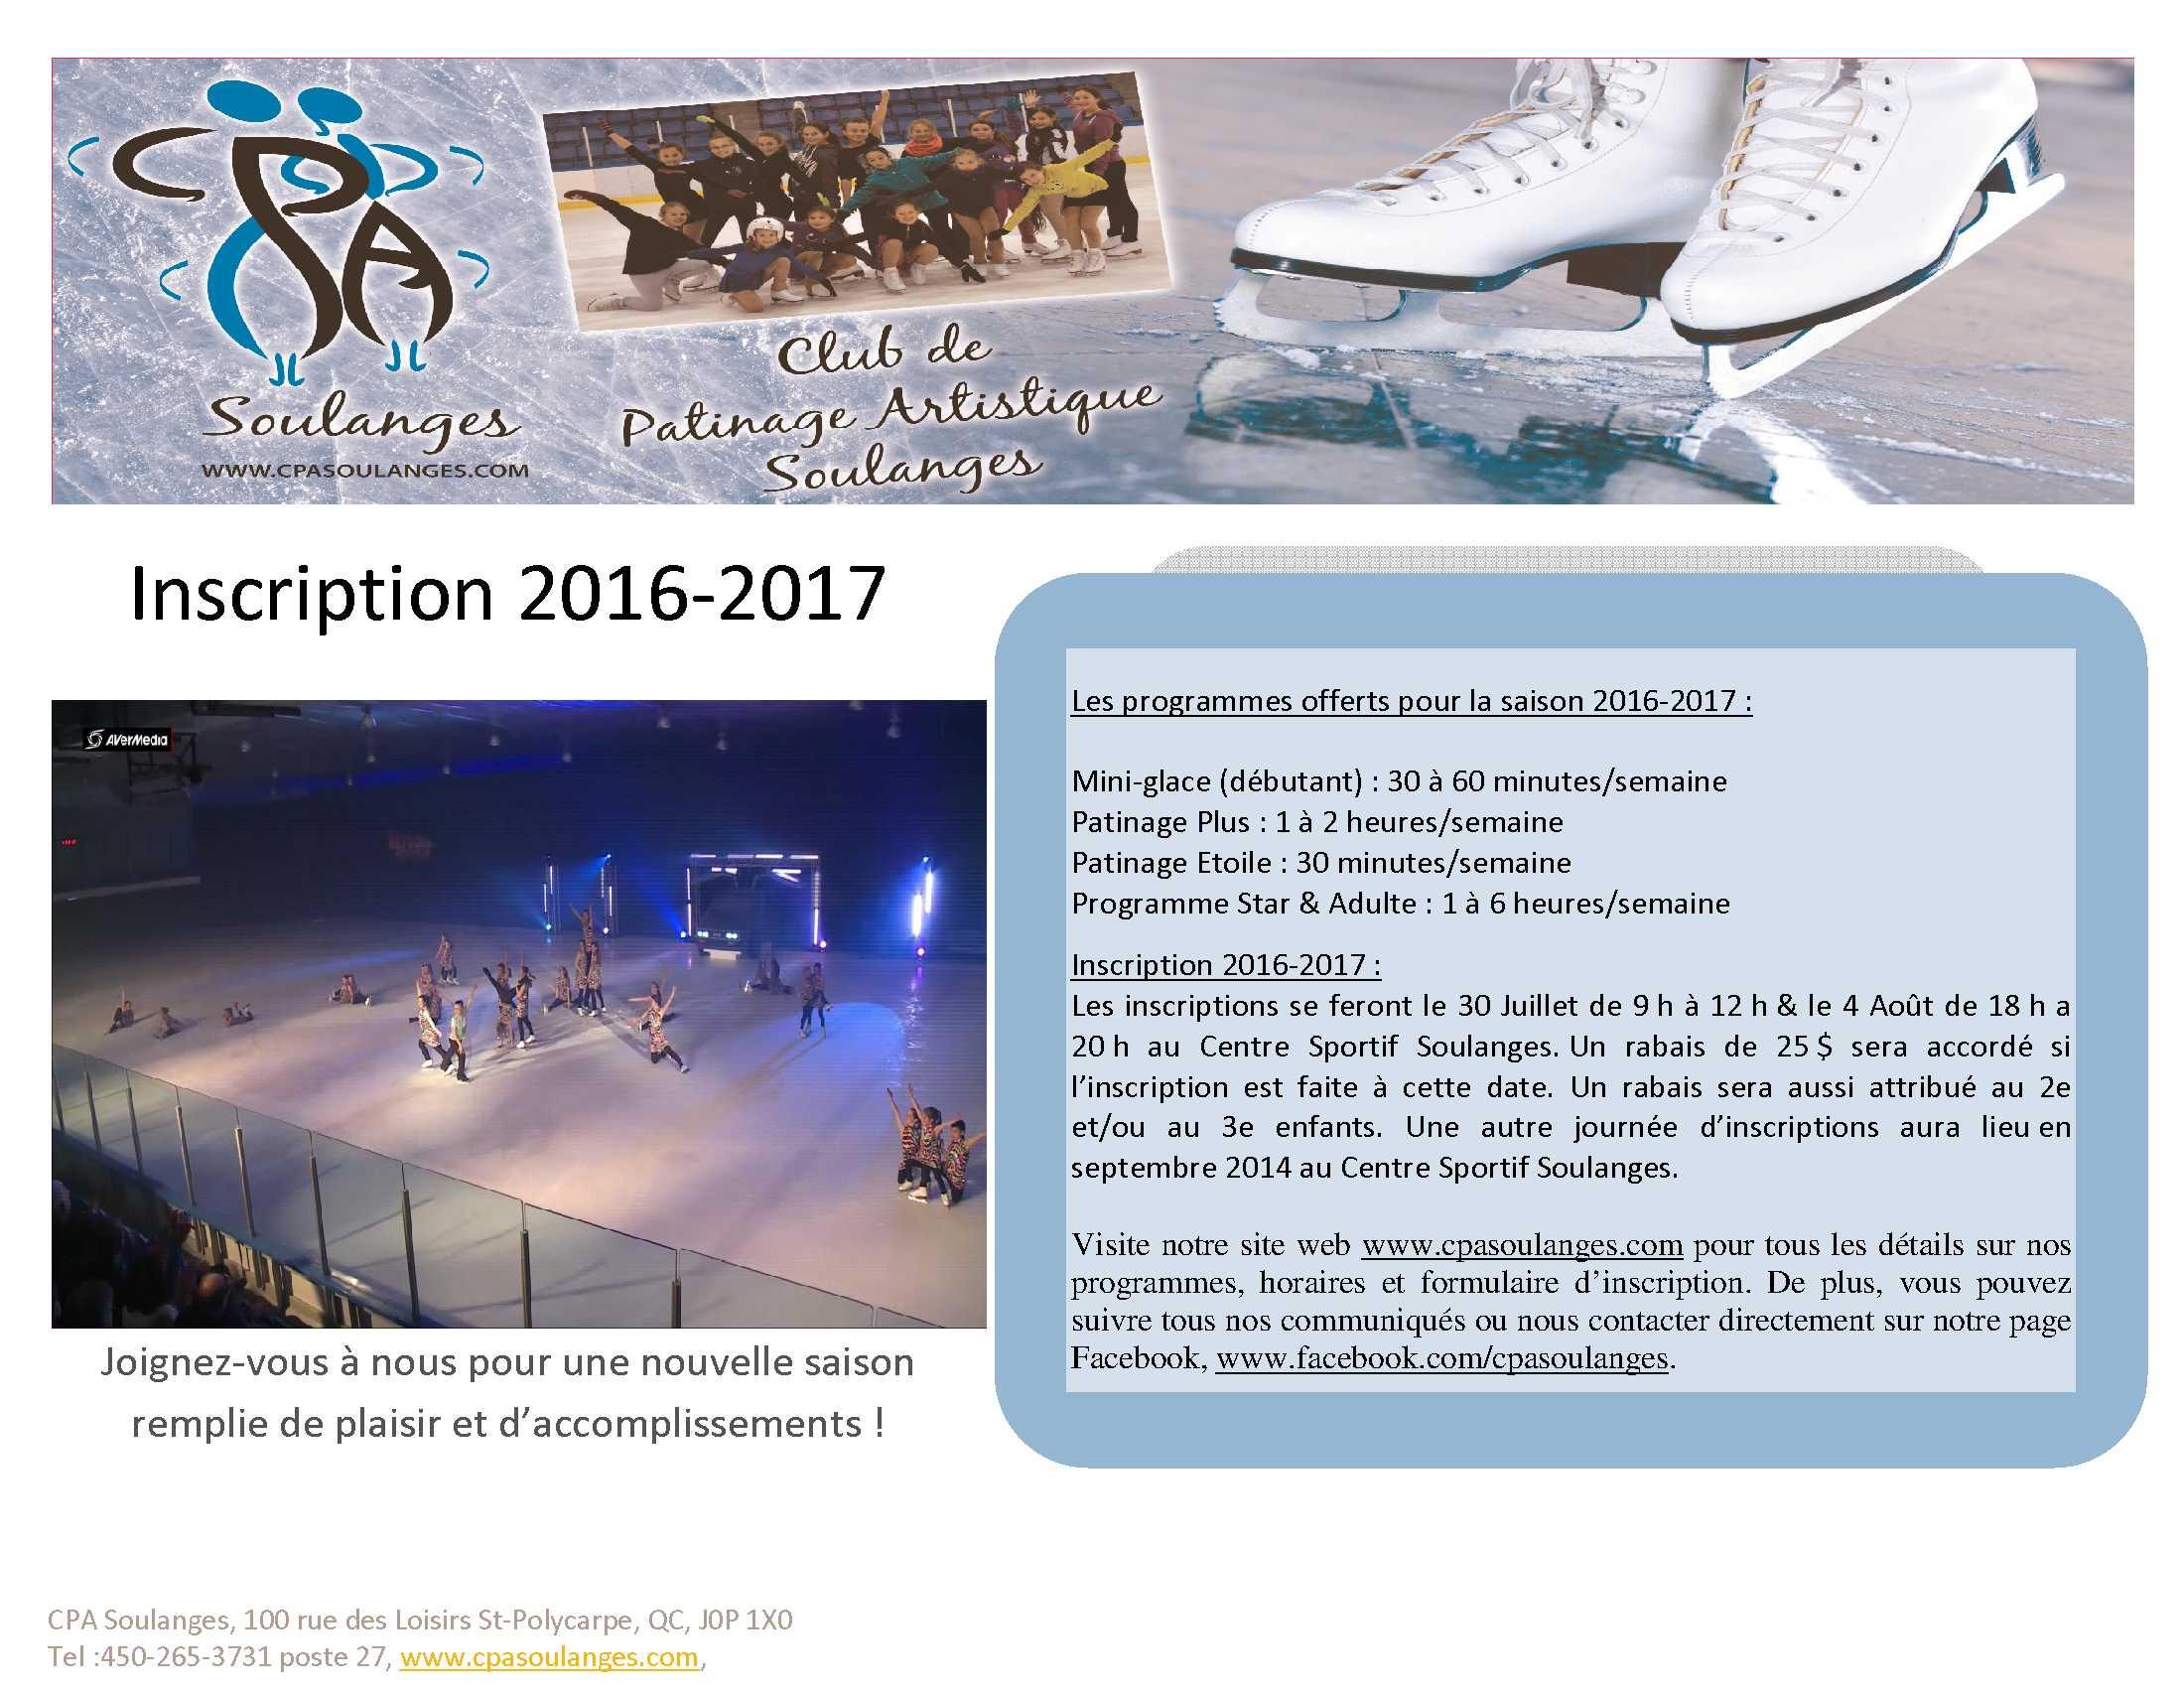 pamphlet insciption 2016-2017 cpa soulanges